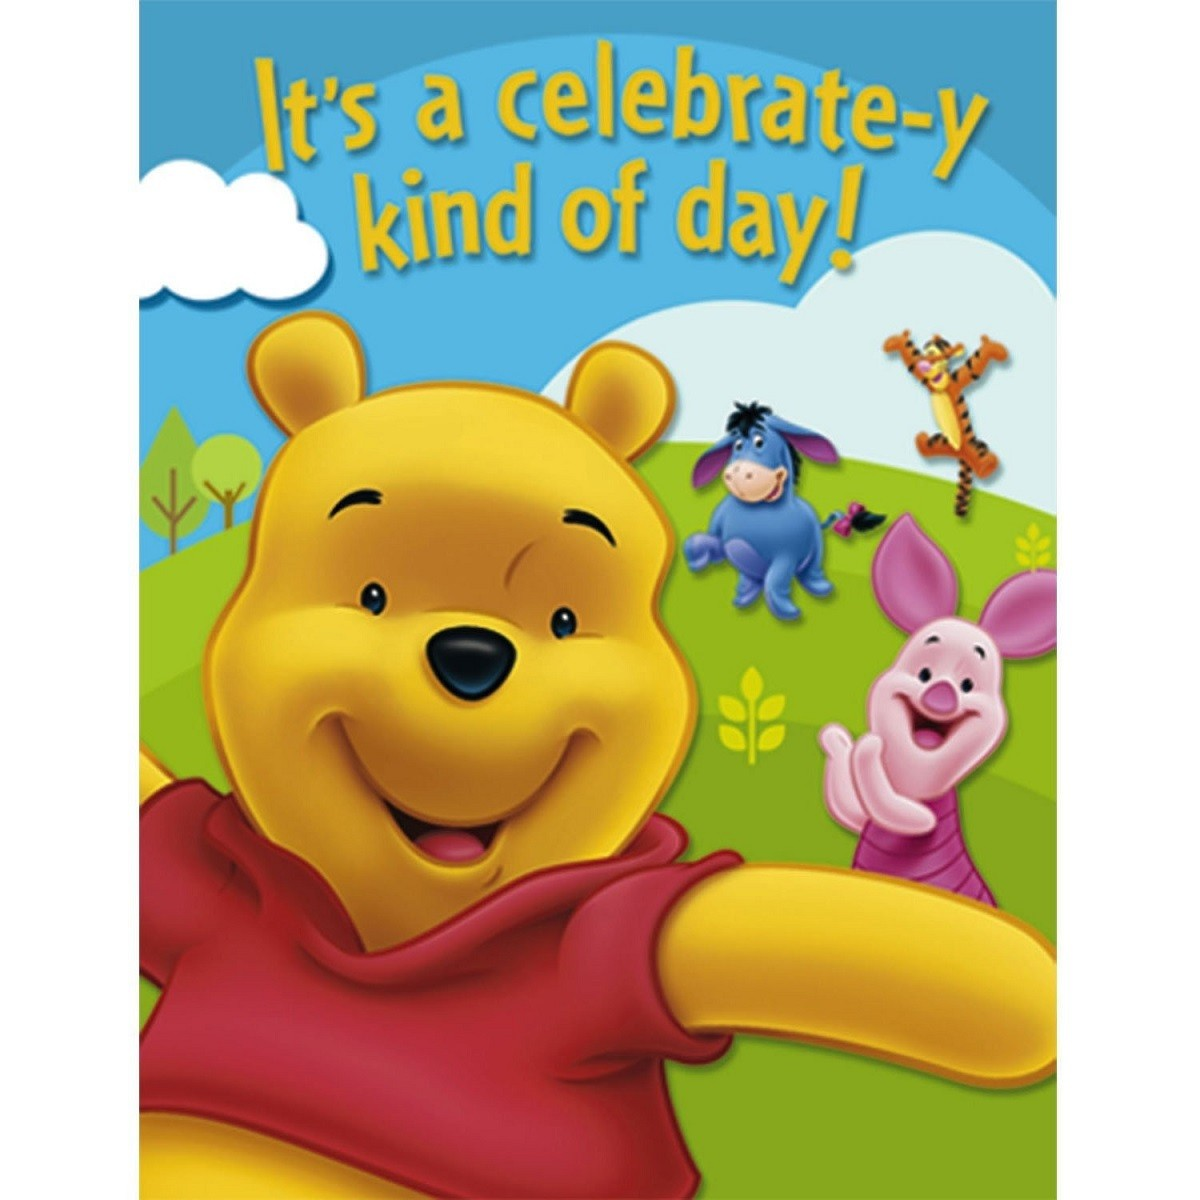 Winnie The Pooh Birthday Invitations Pooh Party Invitations – Winnie the Pooh Party Invitations